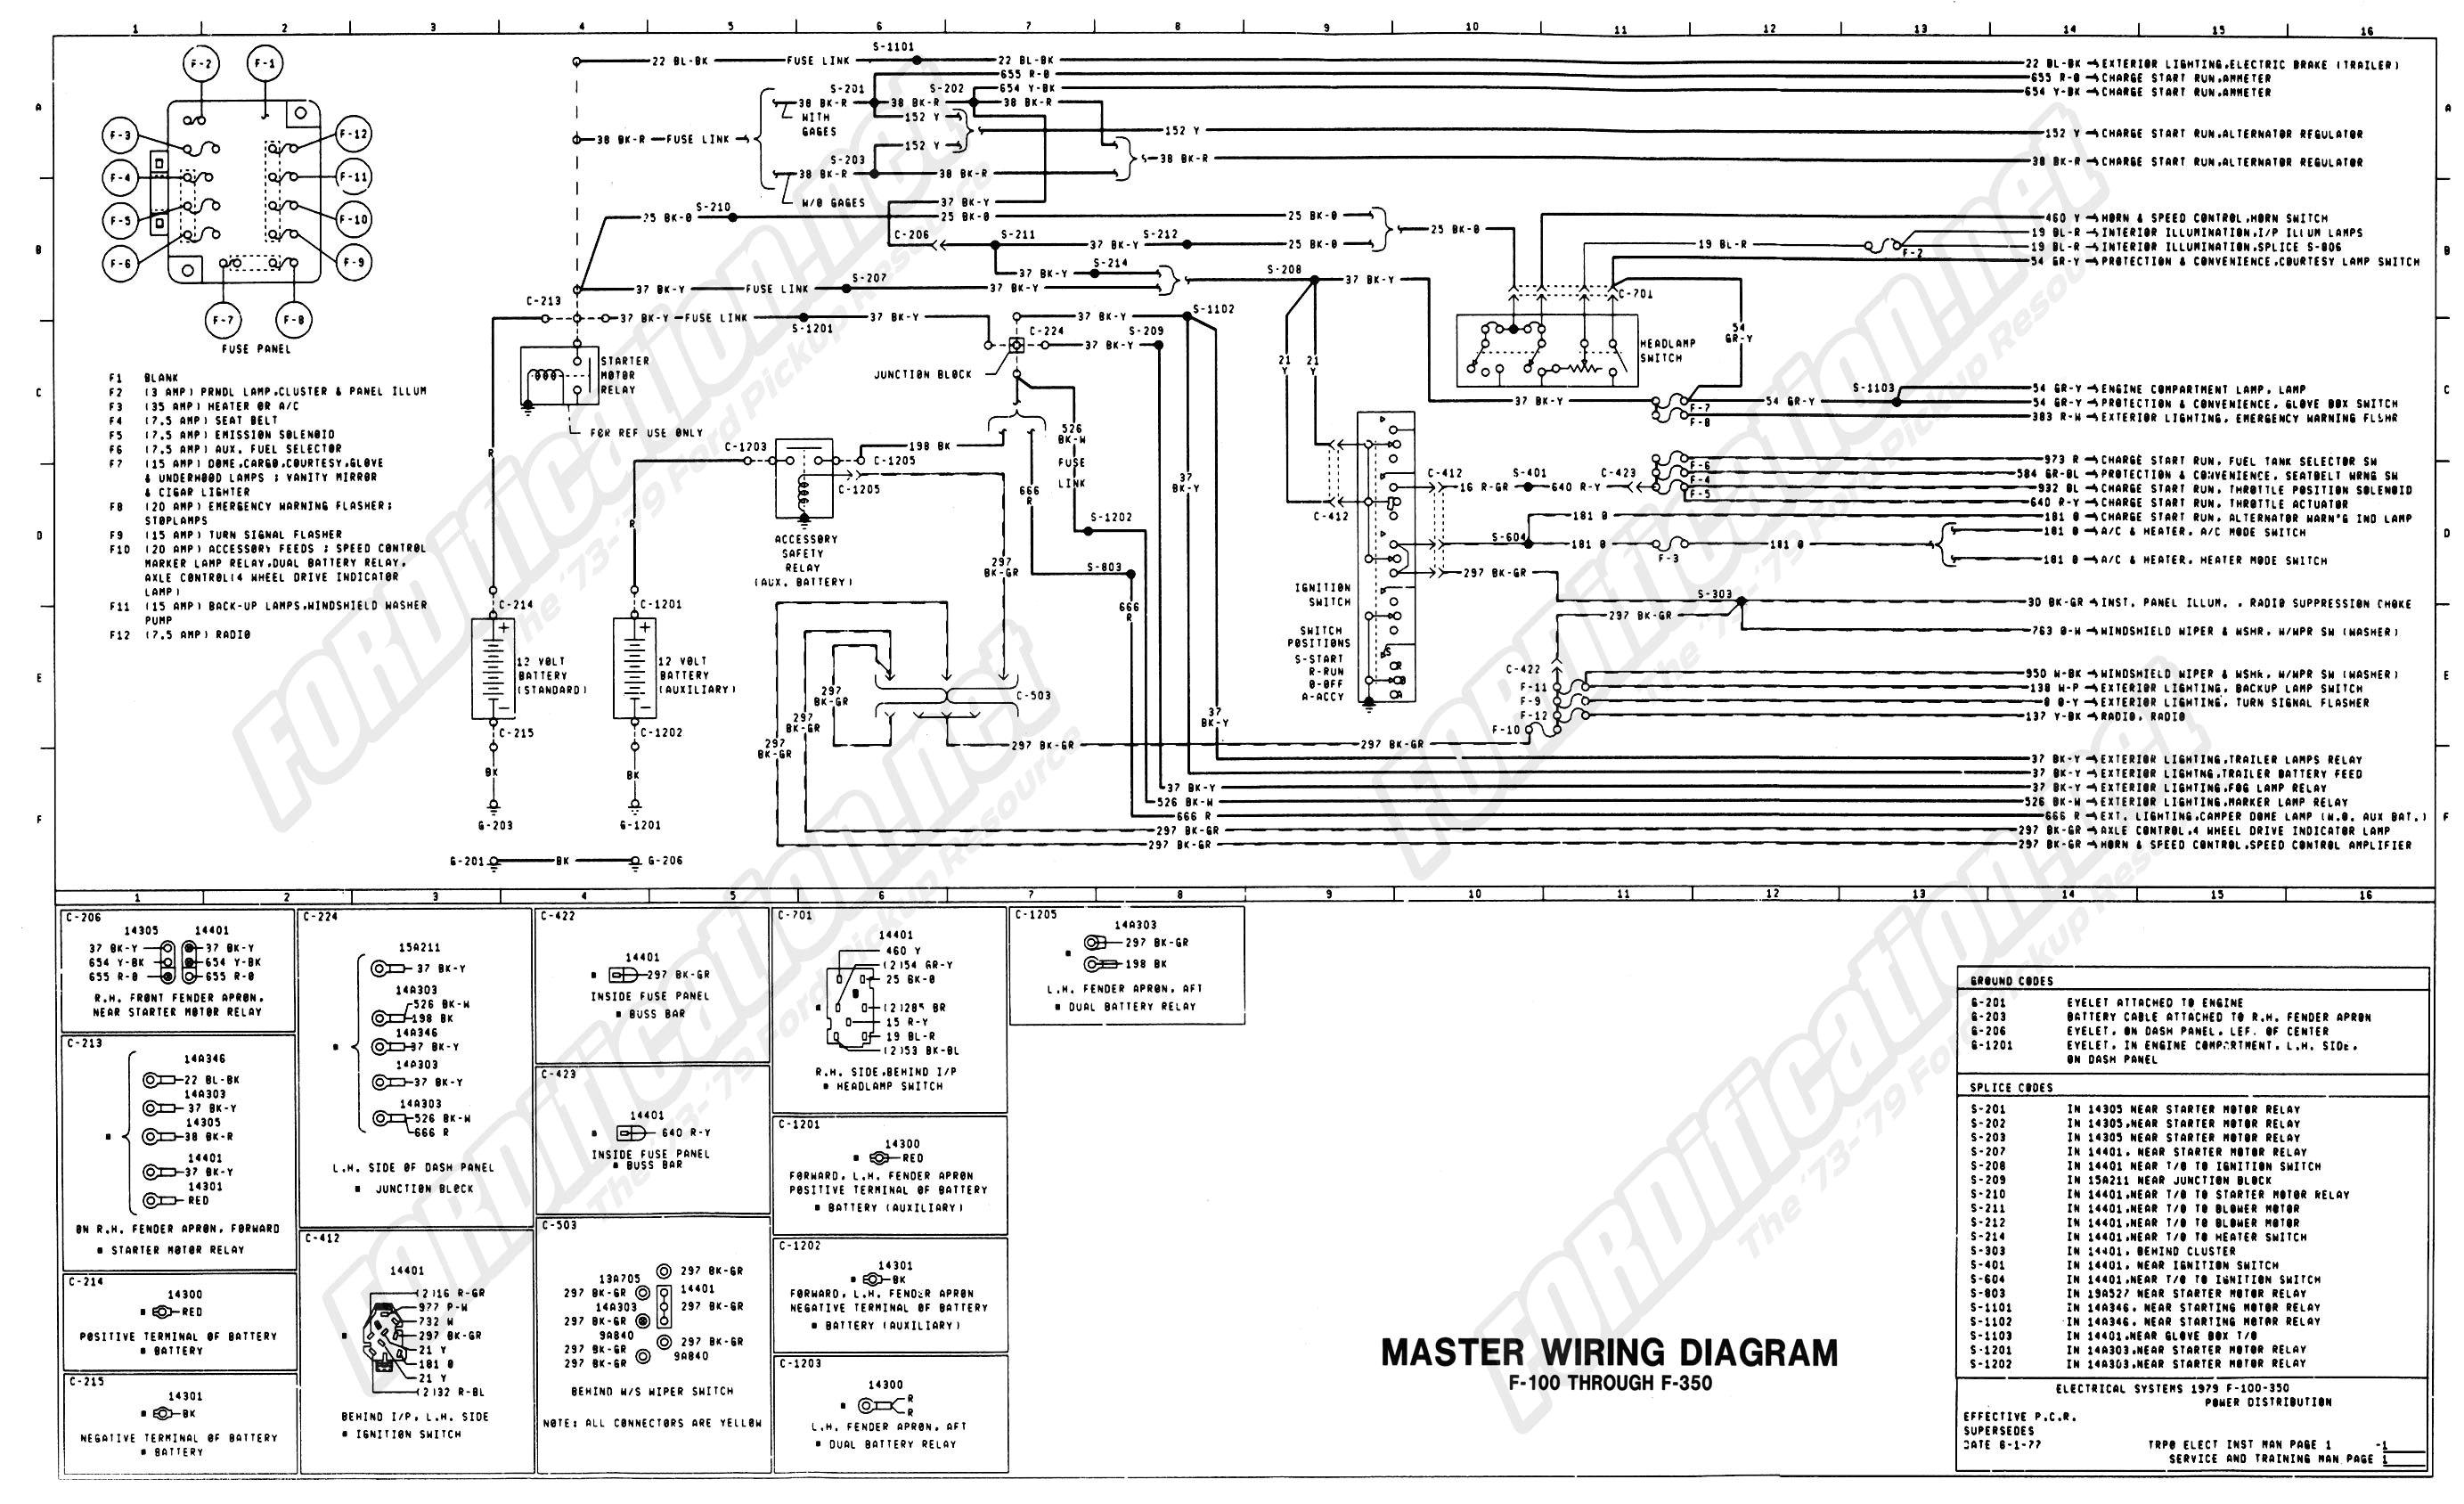 2005 mack truck wiring wiring diagram u model mack truck wiring